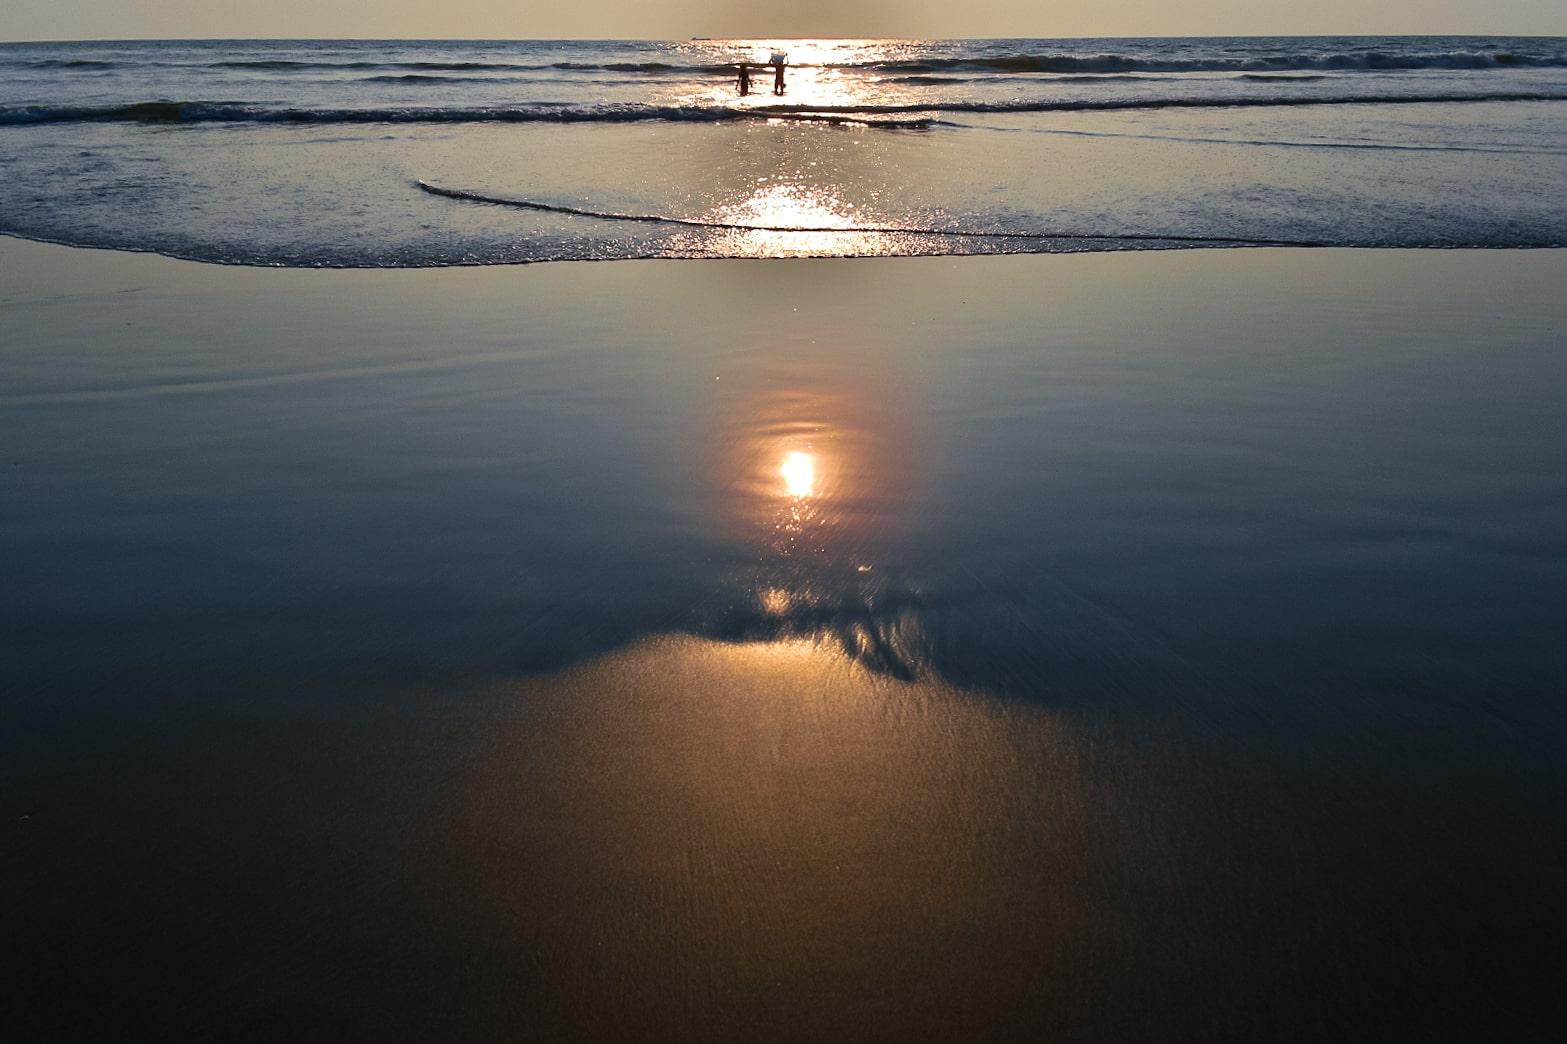 Walk along the Seashore in your Solo Trip to Goa